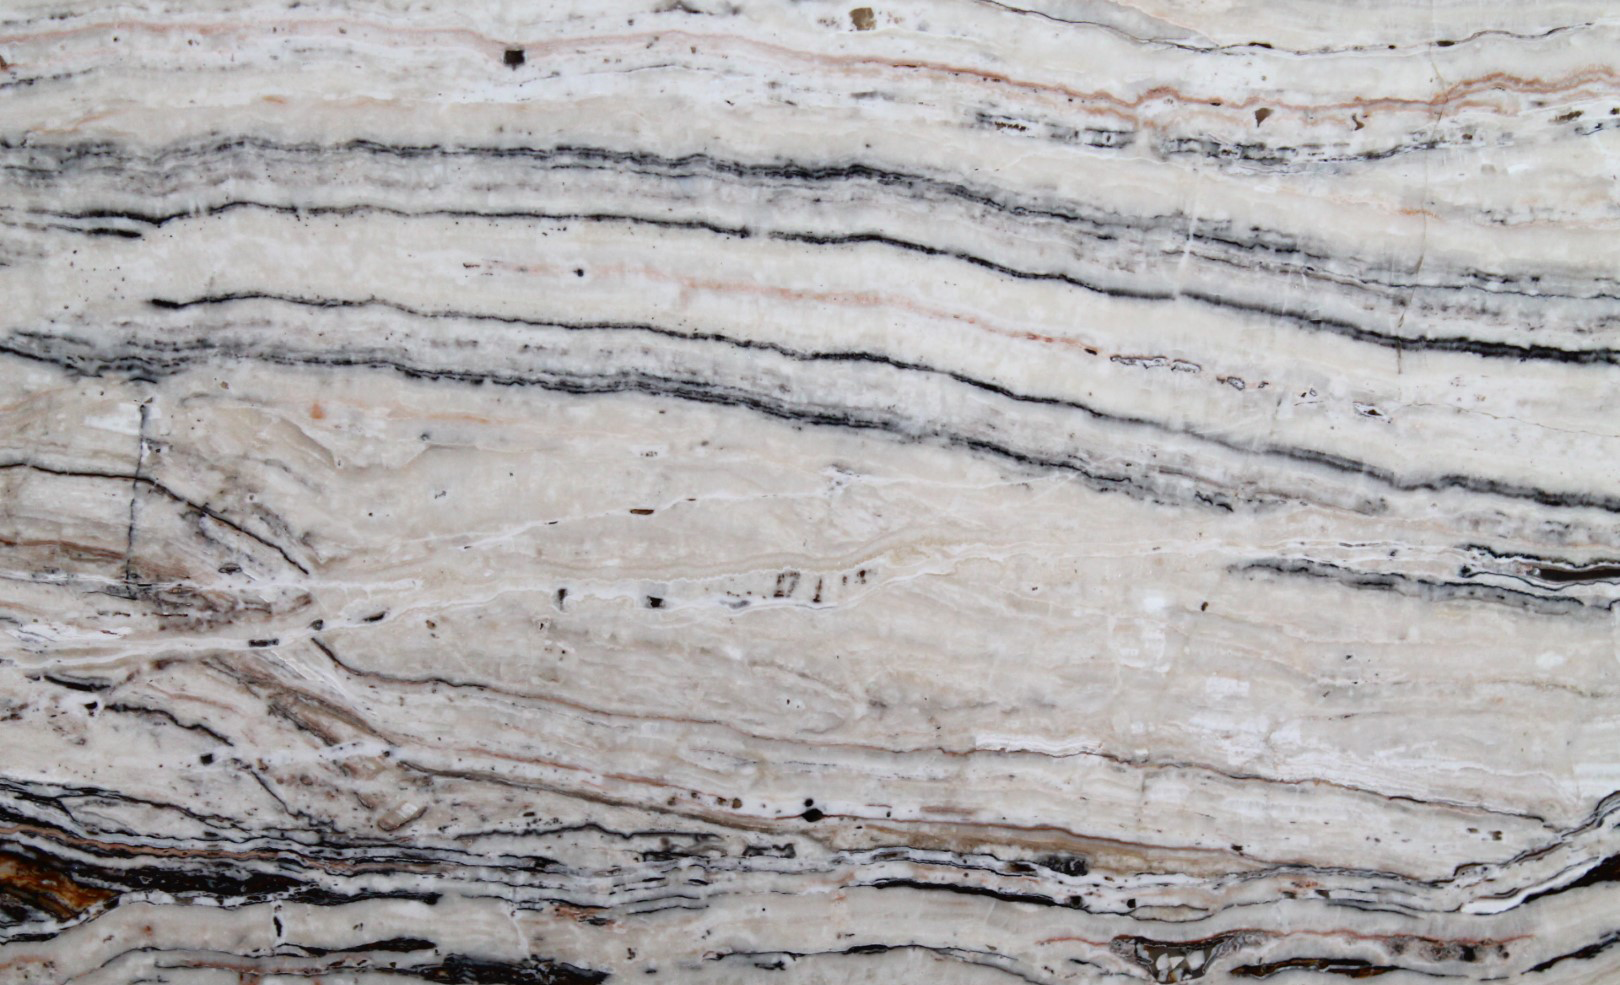 Onyx Cirrostratus pol 191114-1329 (2).pn